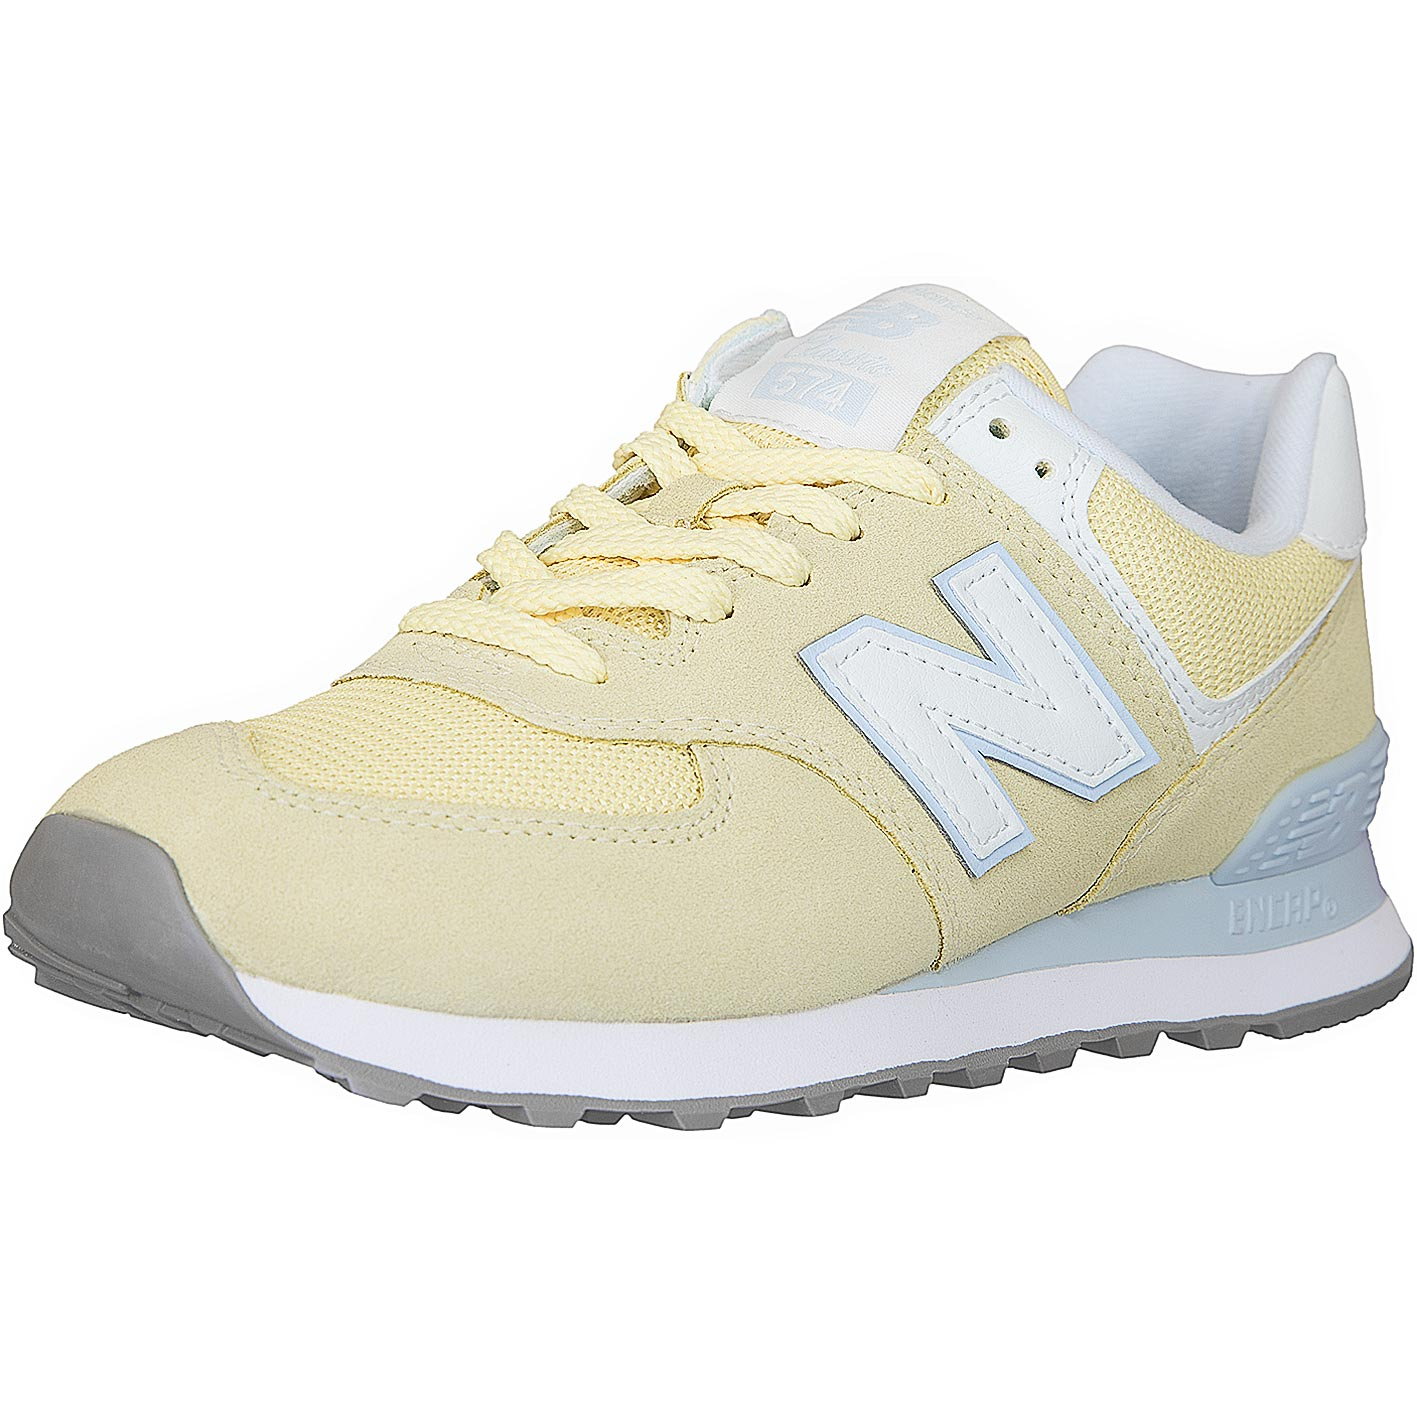 ☆ New Balance Damen Sneaker 574 Wildleder/Mesh gelb - hier ...